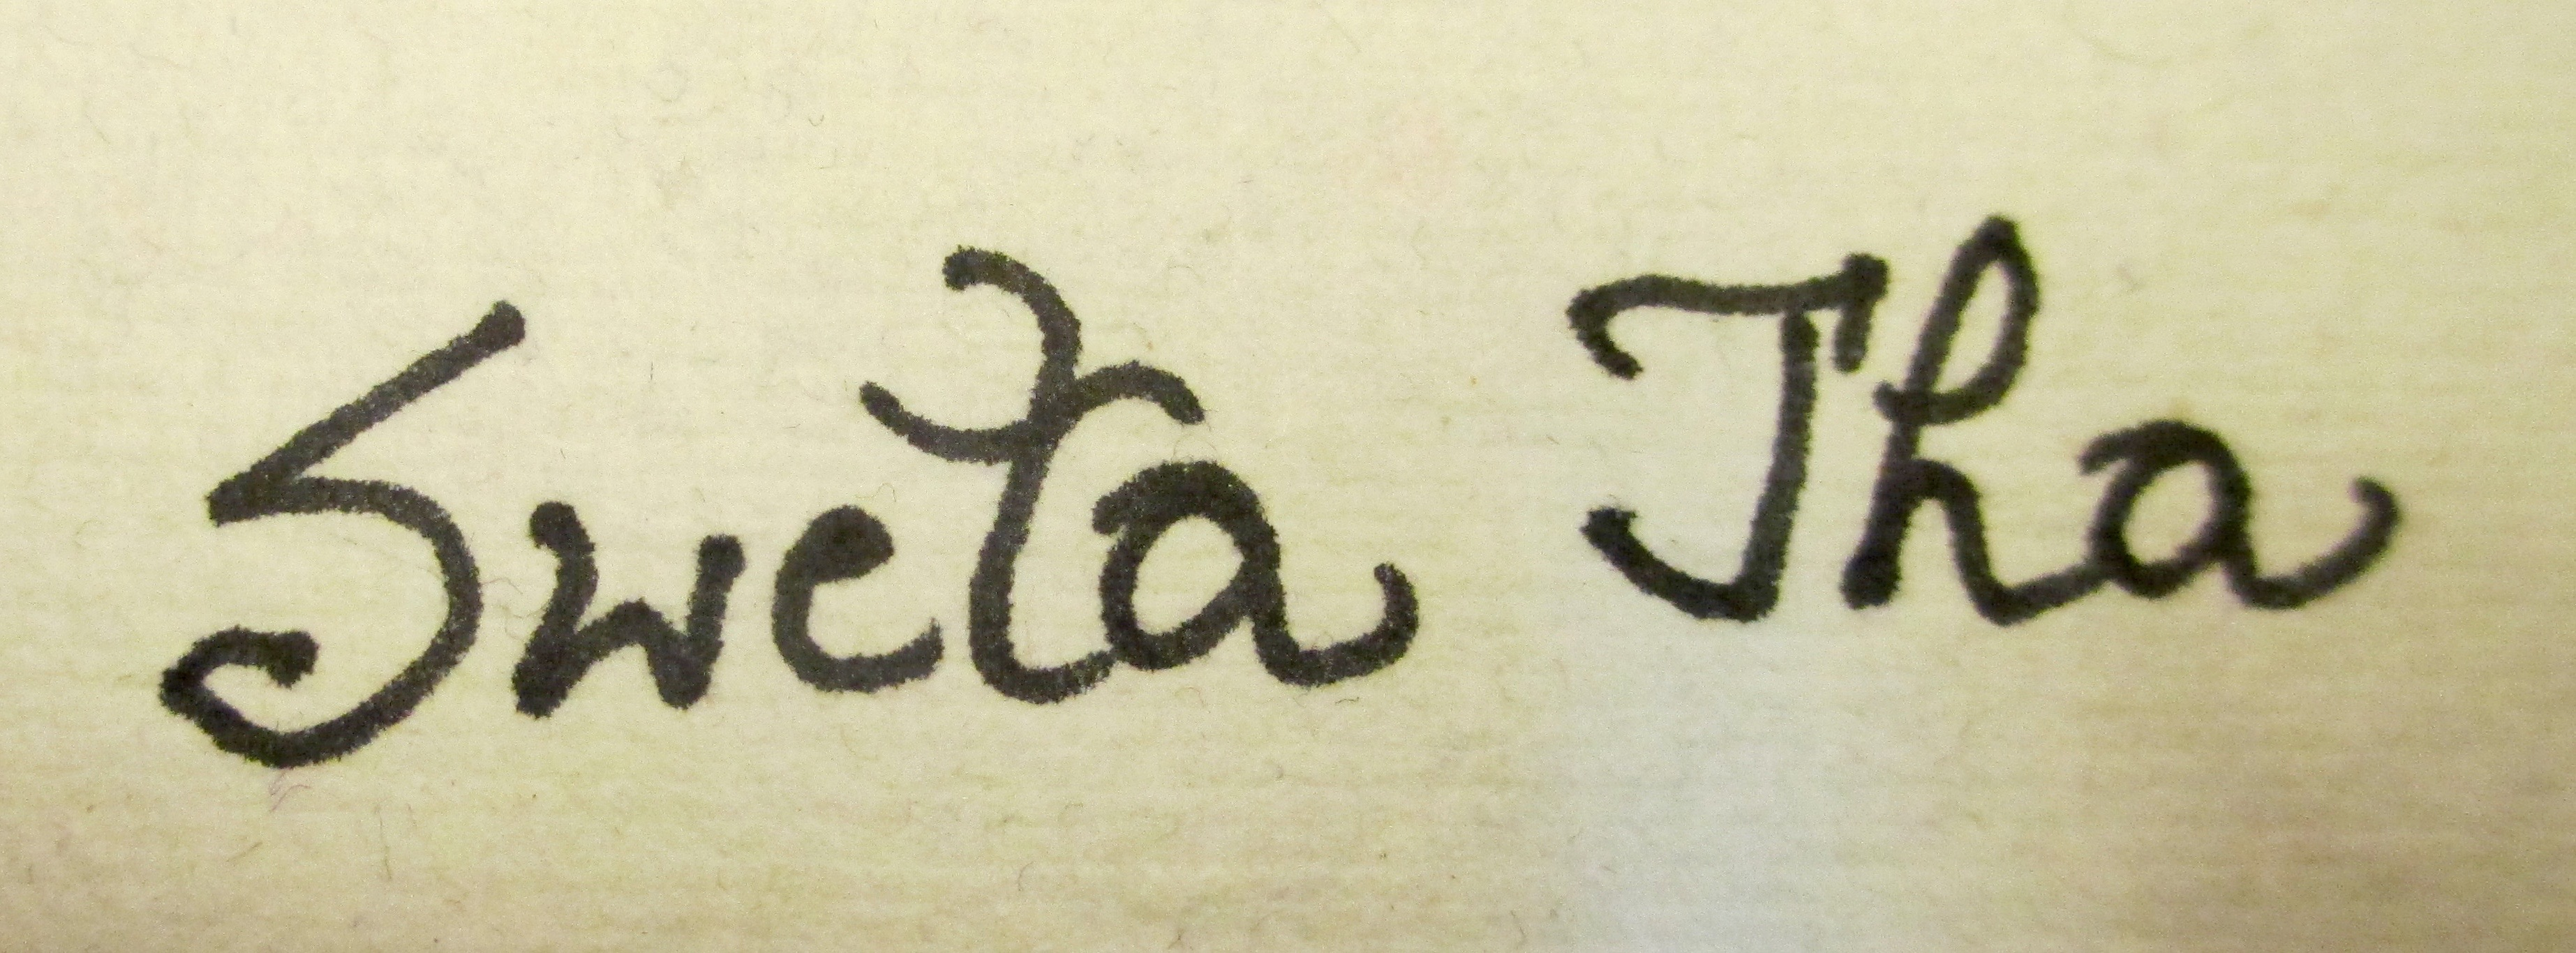 Sweta Jha's Signature